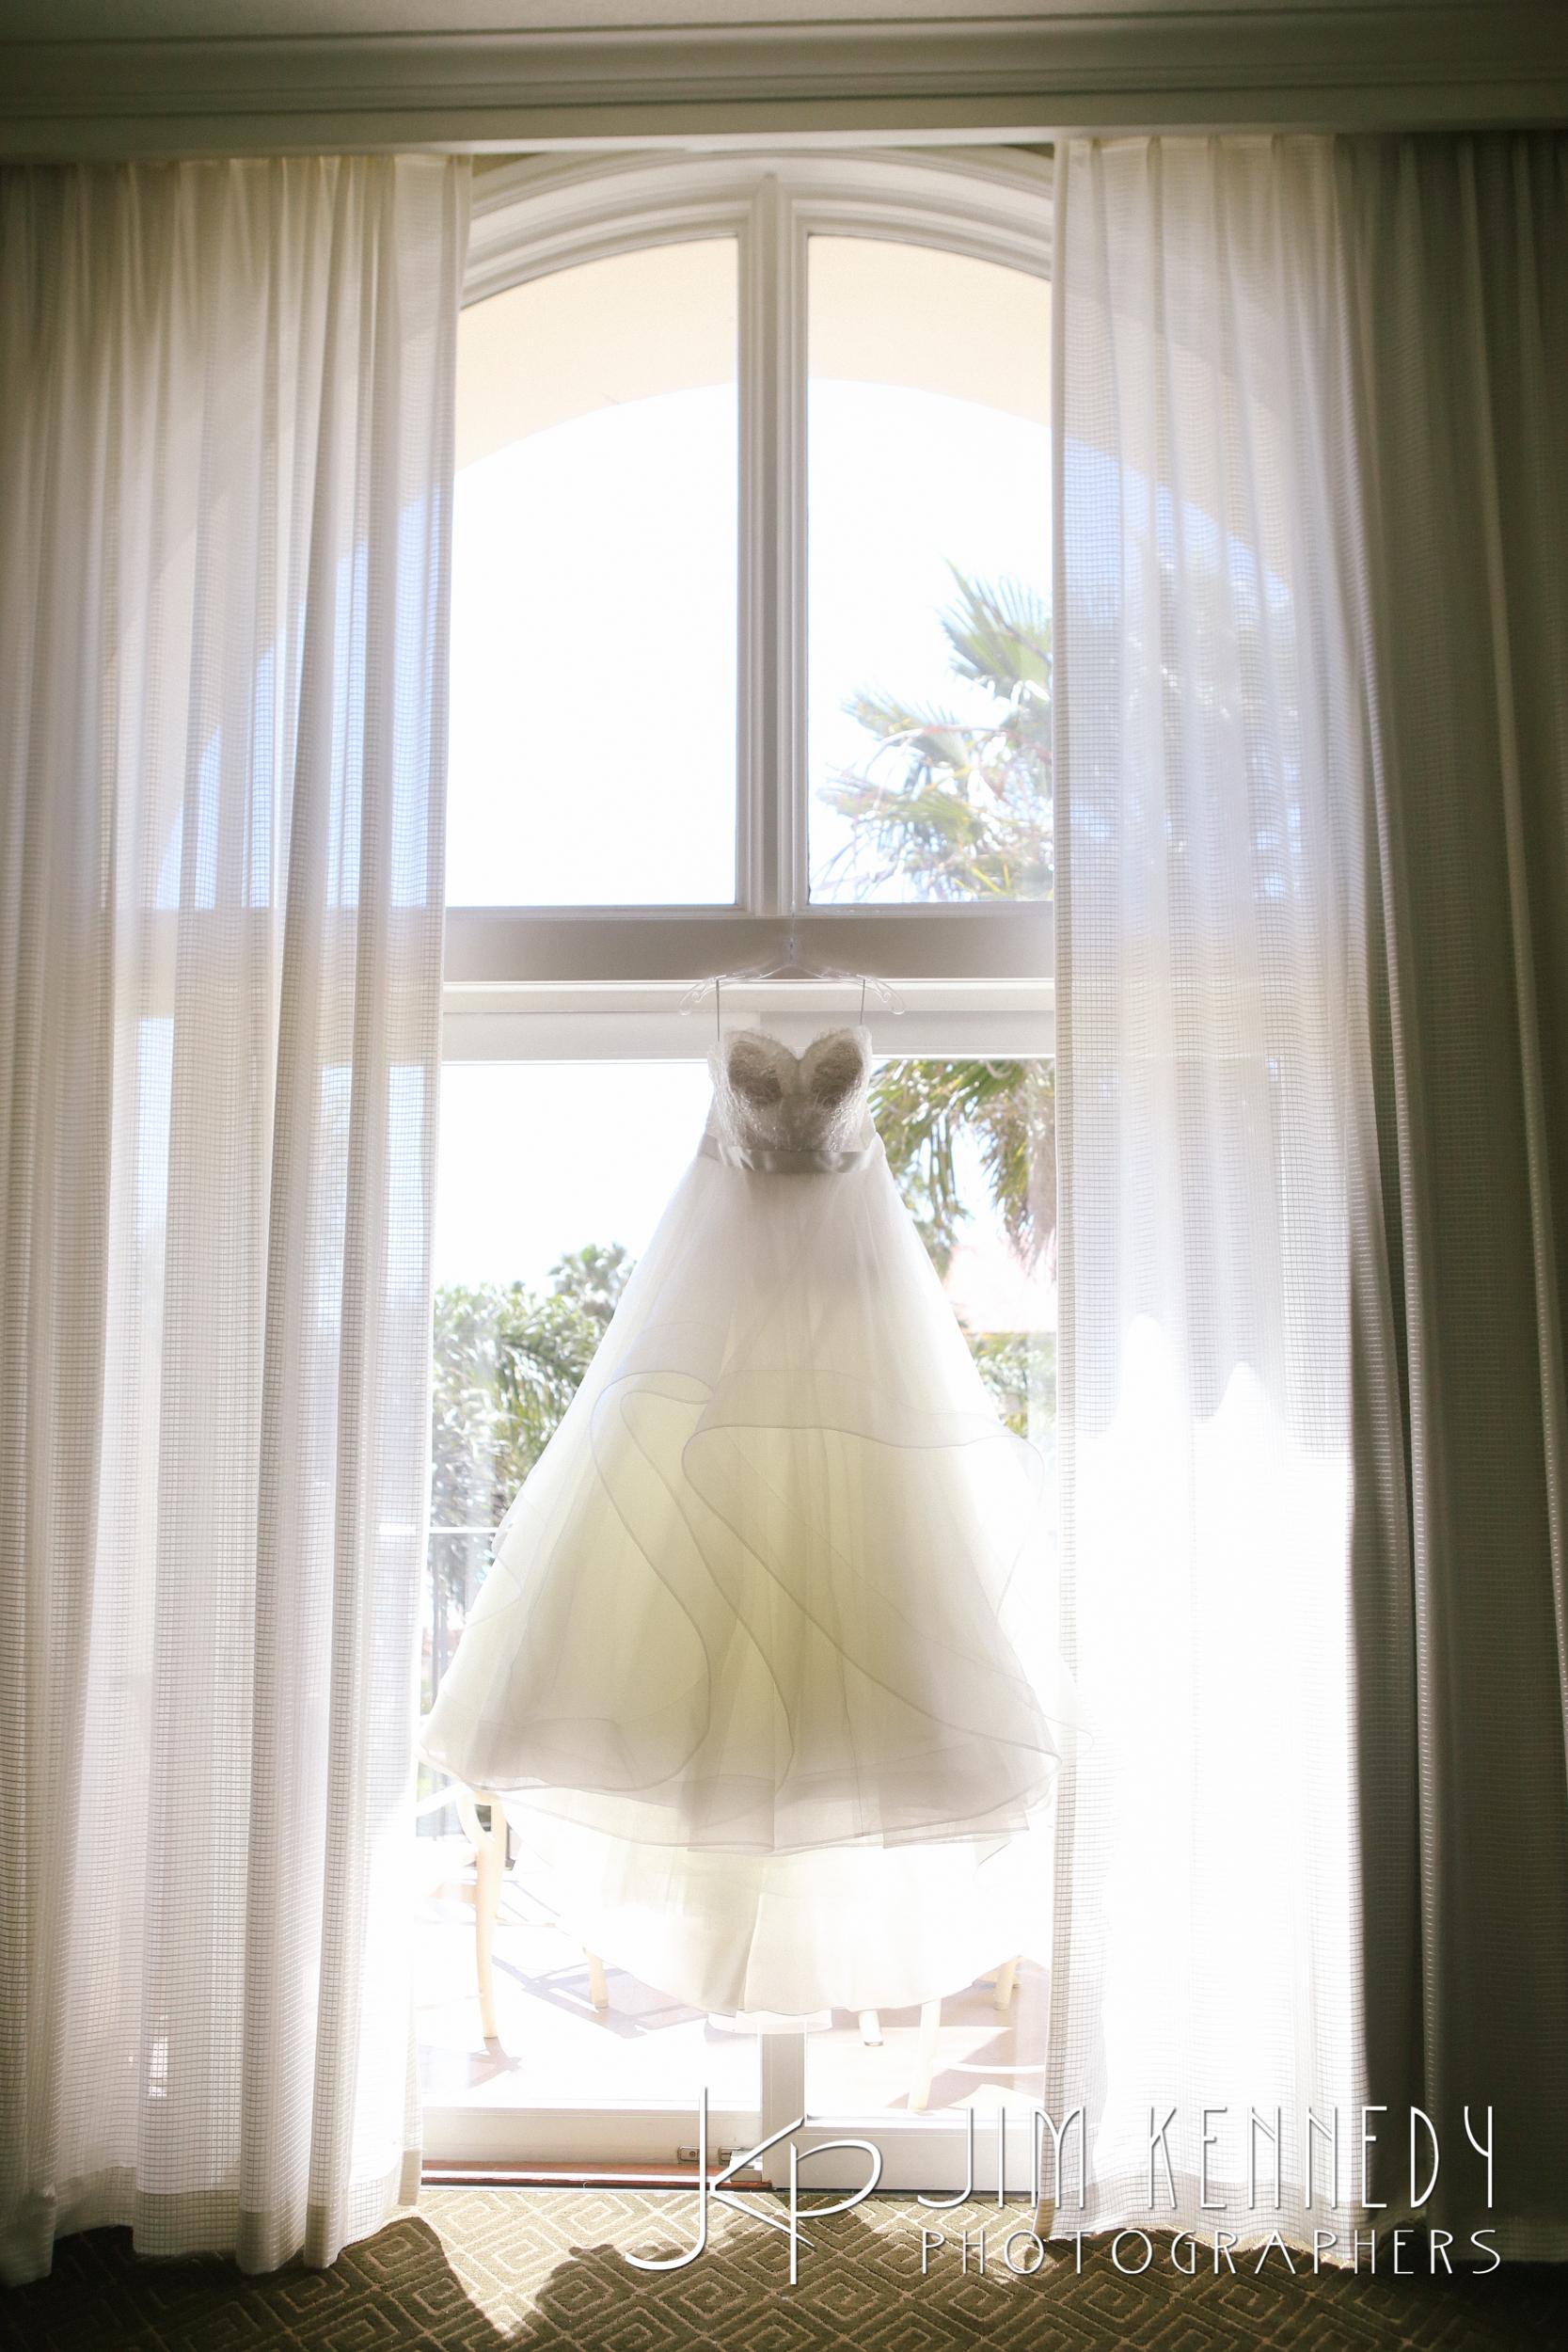 huntington-beach-wedding-003.JPG